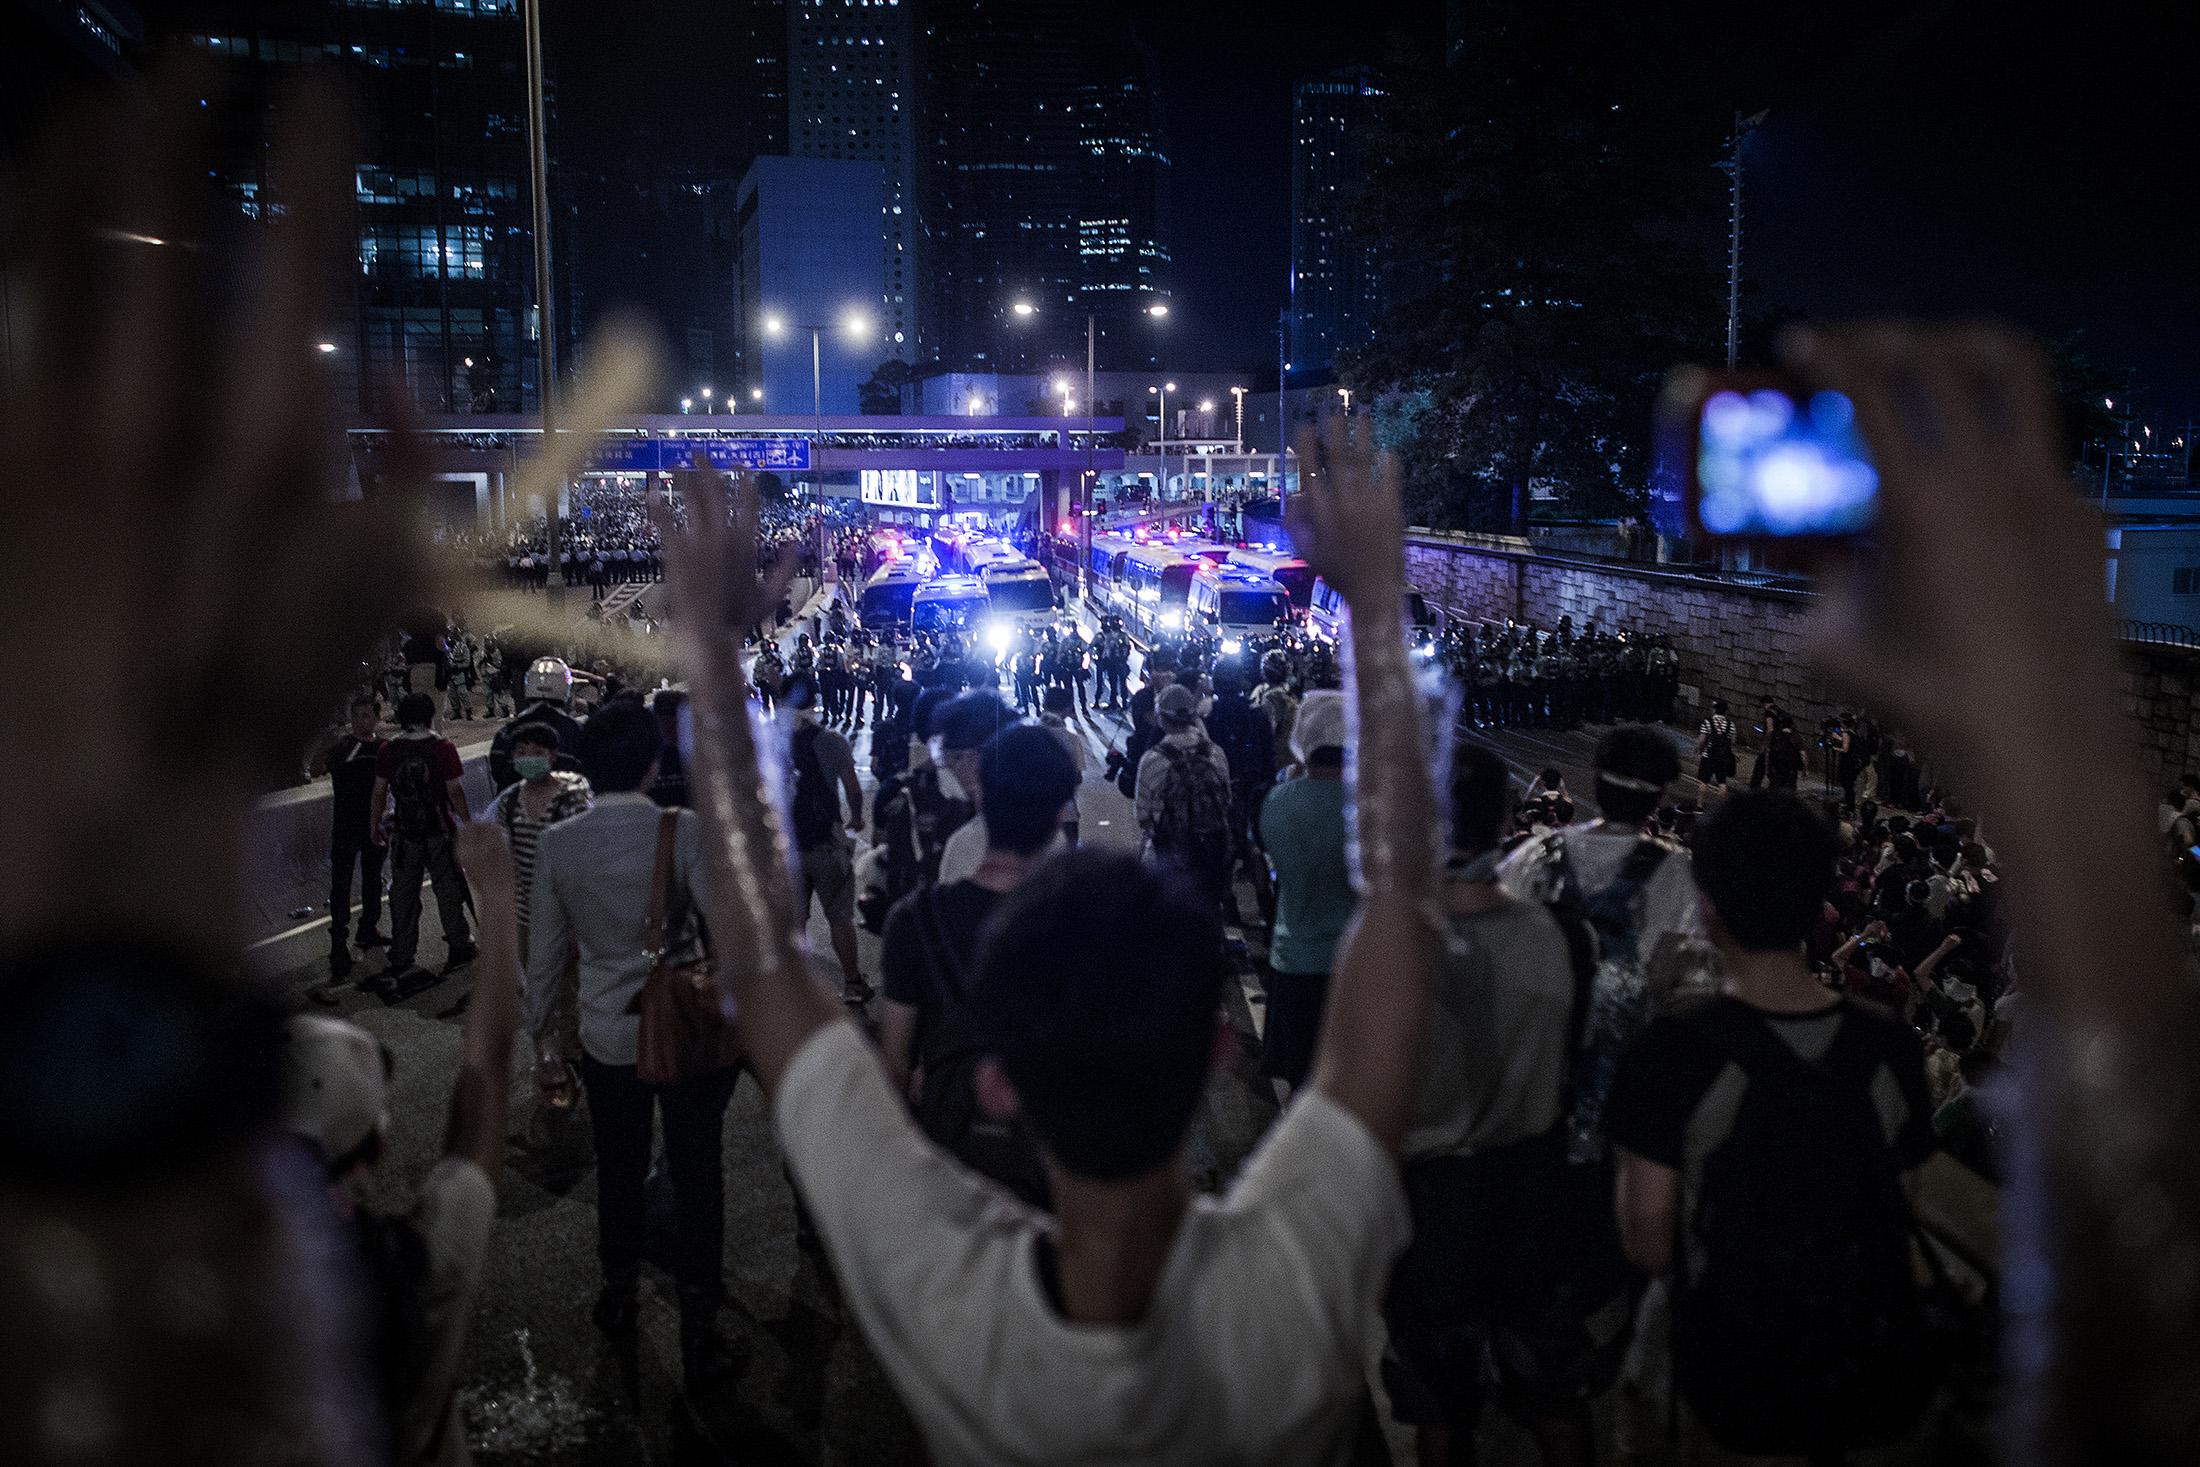 Occupy006.jpg